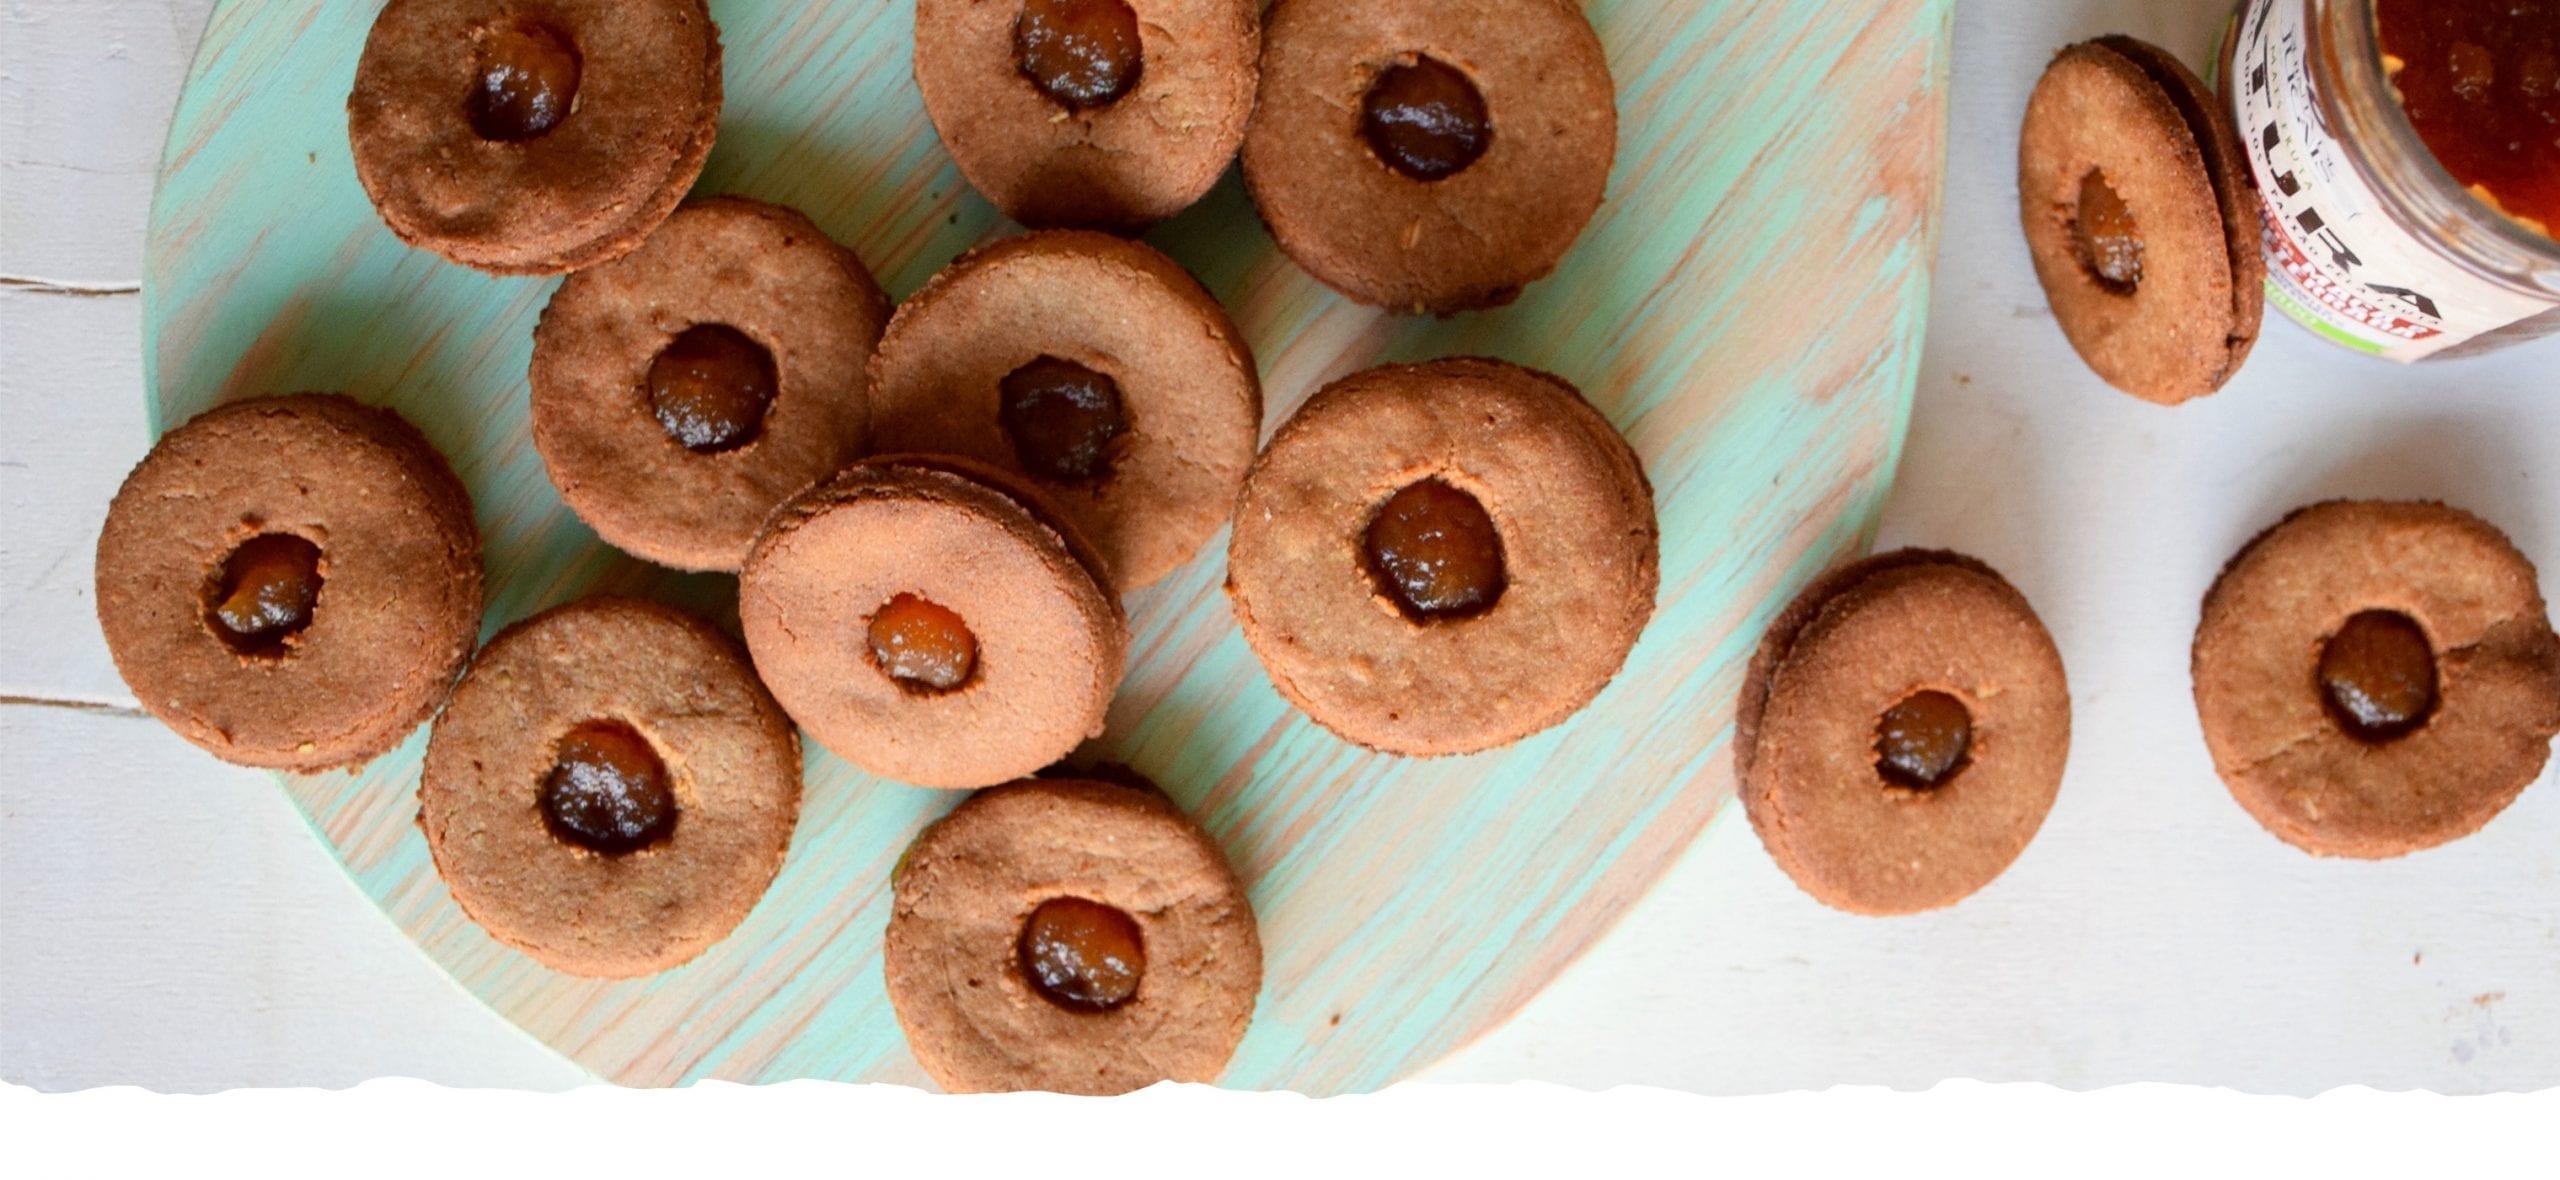 Cookies de Amaranto com Doce de Natura Maçã e Beterraba